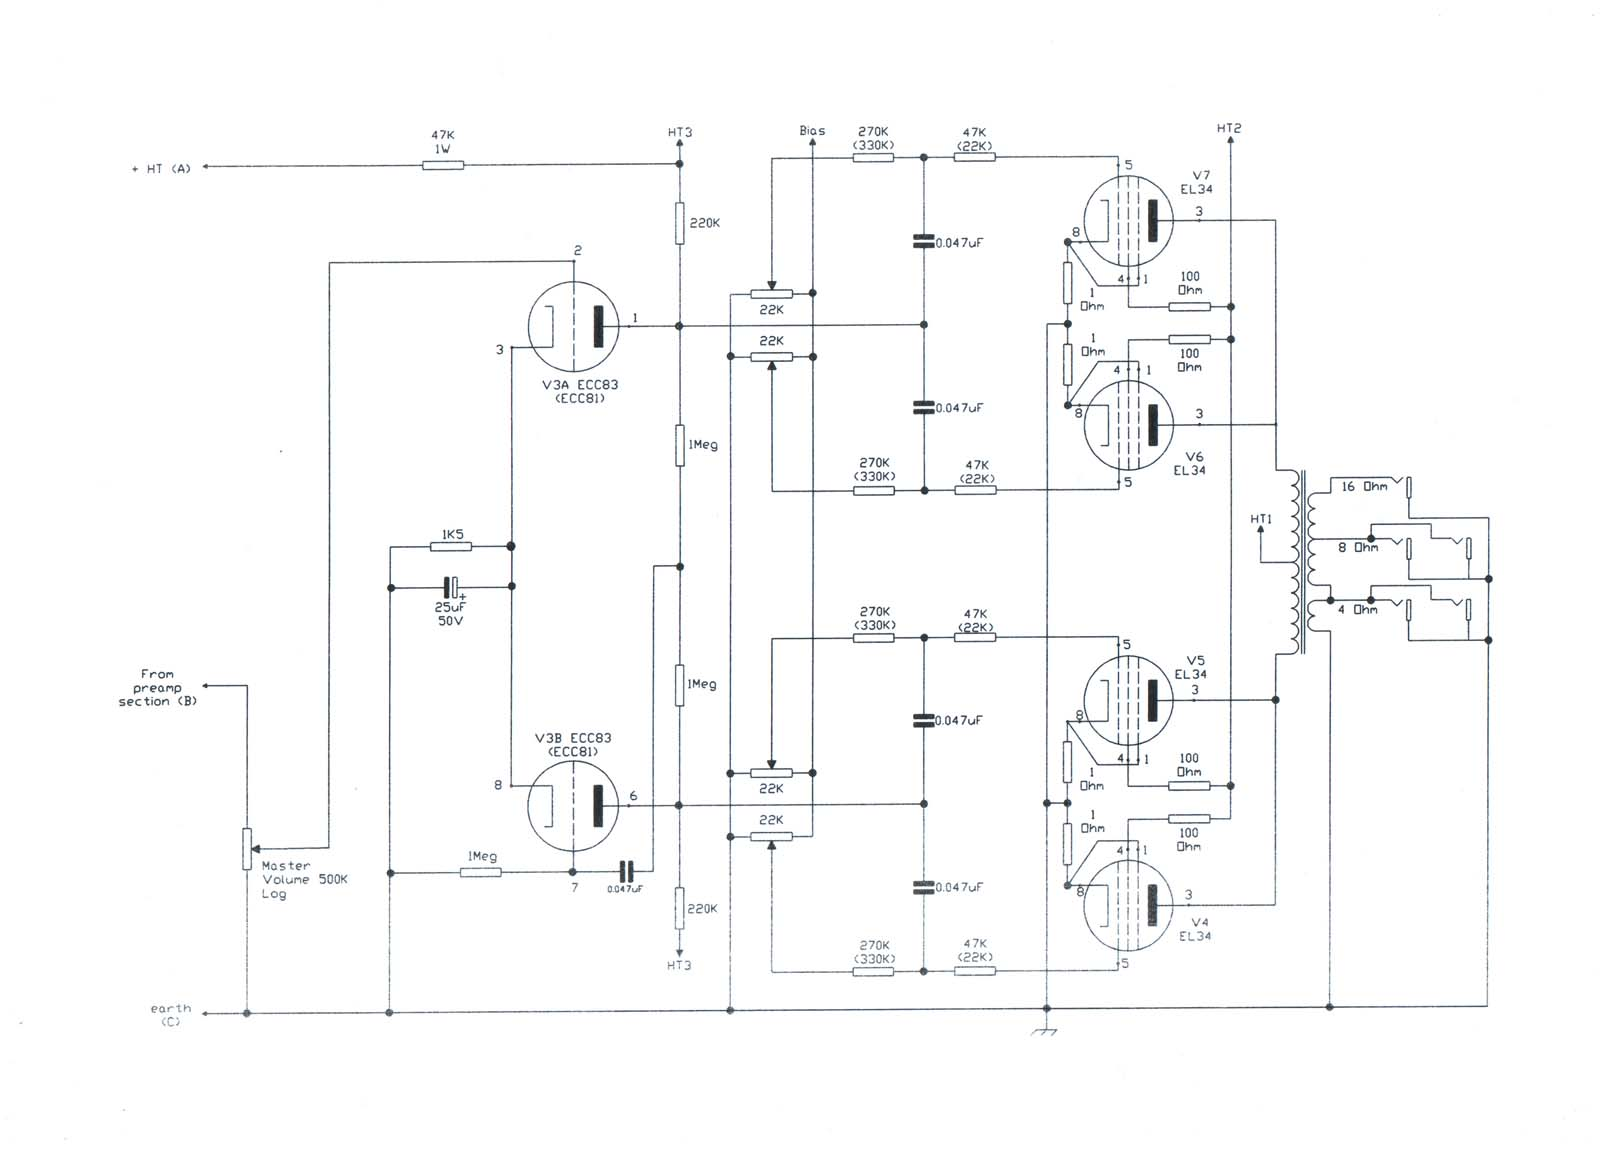 2 Amp 2 Capacitor Wiring